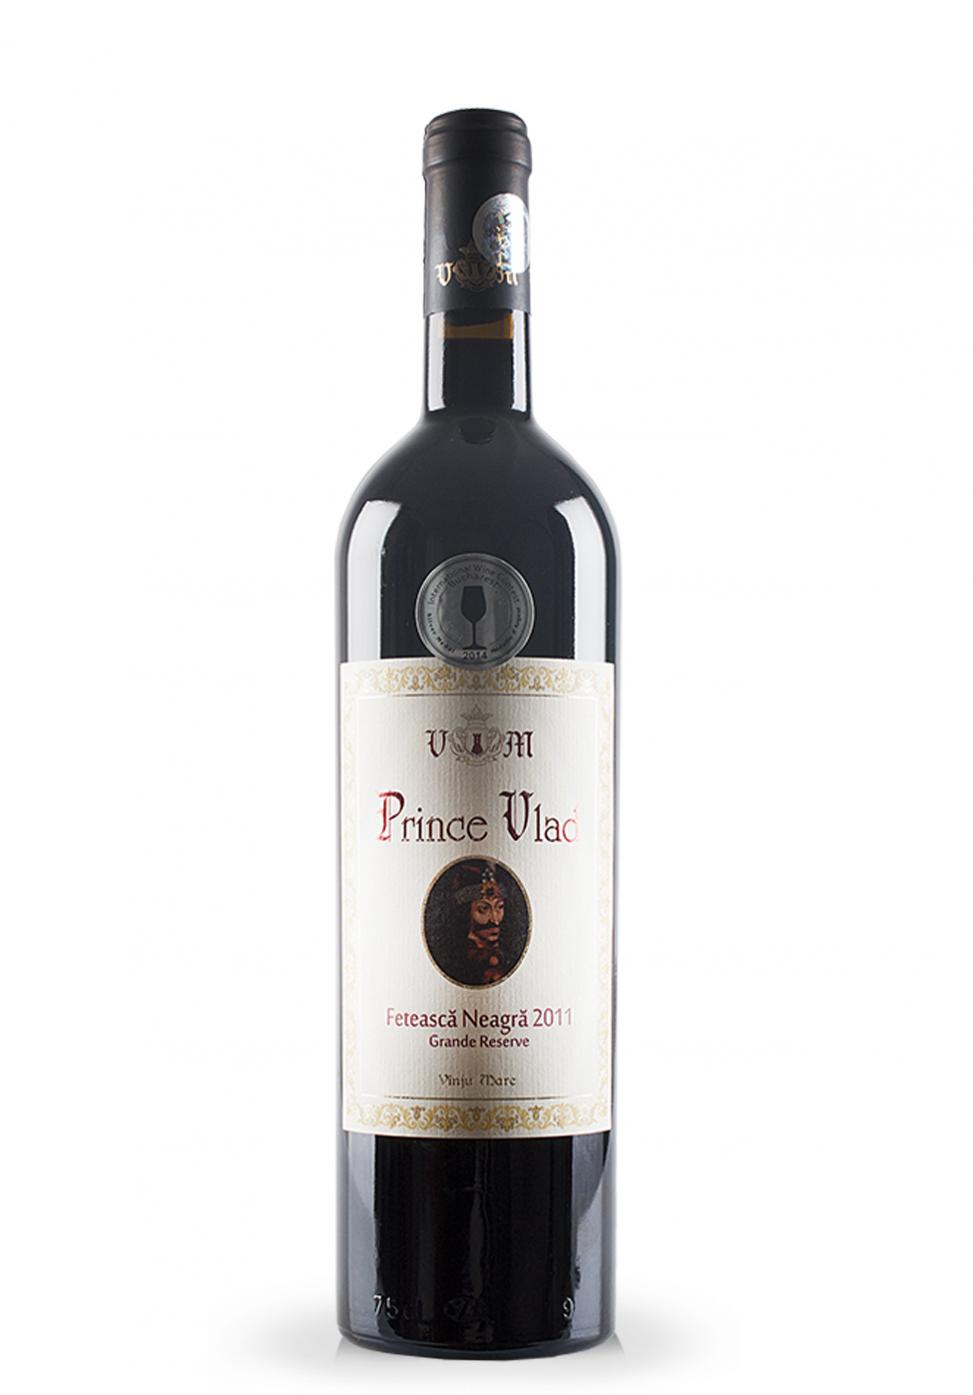 Vin Domeniile Vinju Mare, Prince Vlad Grande Reserve, Feteasca Neagra 2013 (0.75L)